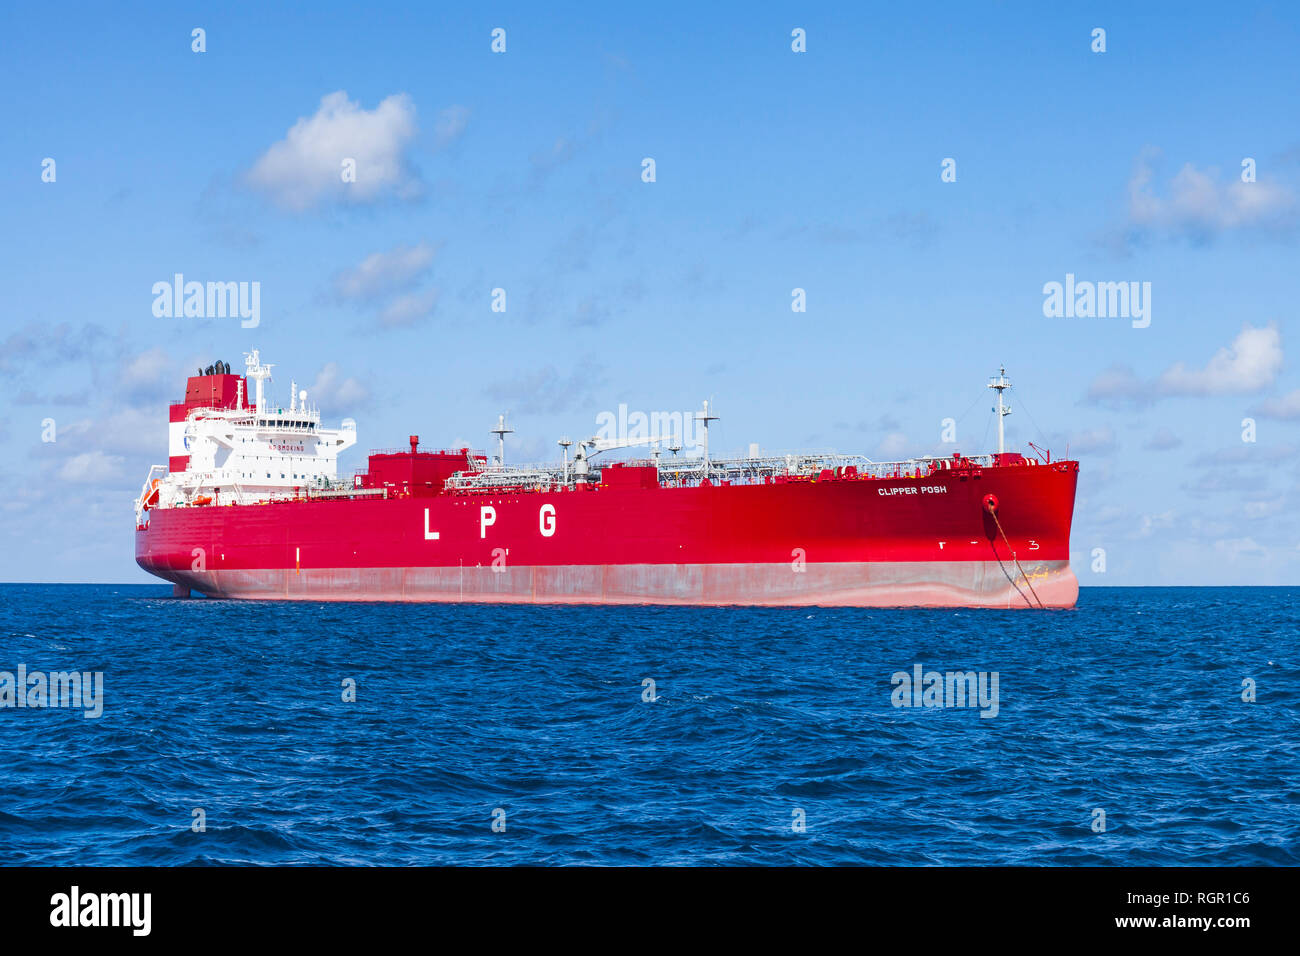 LPG tanker ship, Clipper Posh, Caribbean seas. - Stock Image